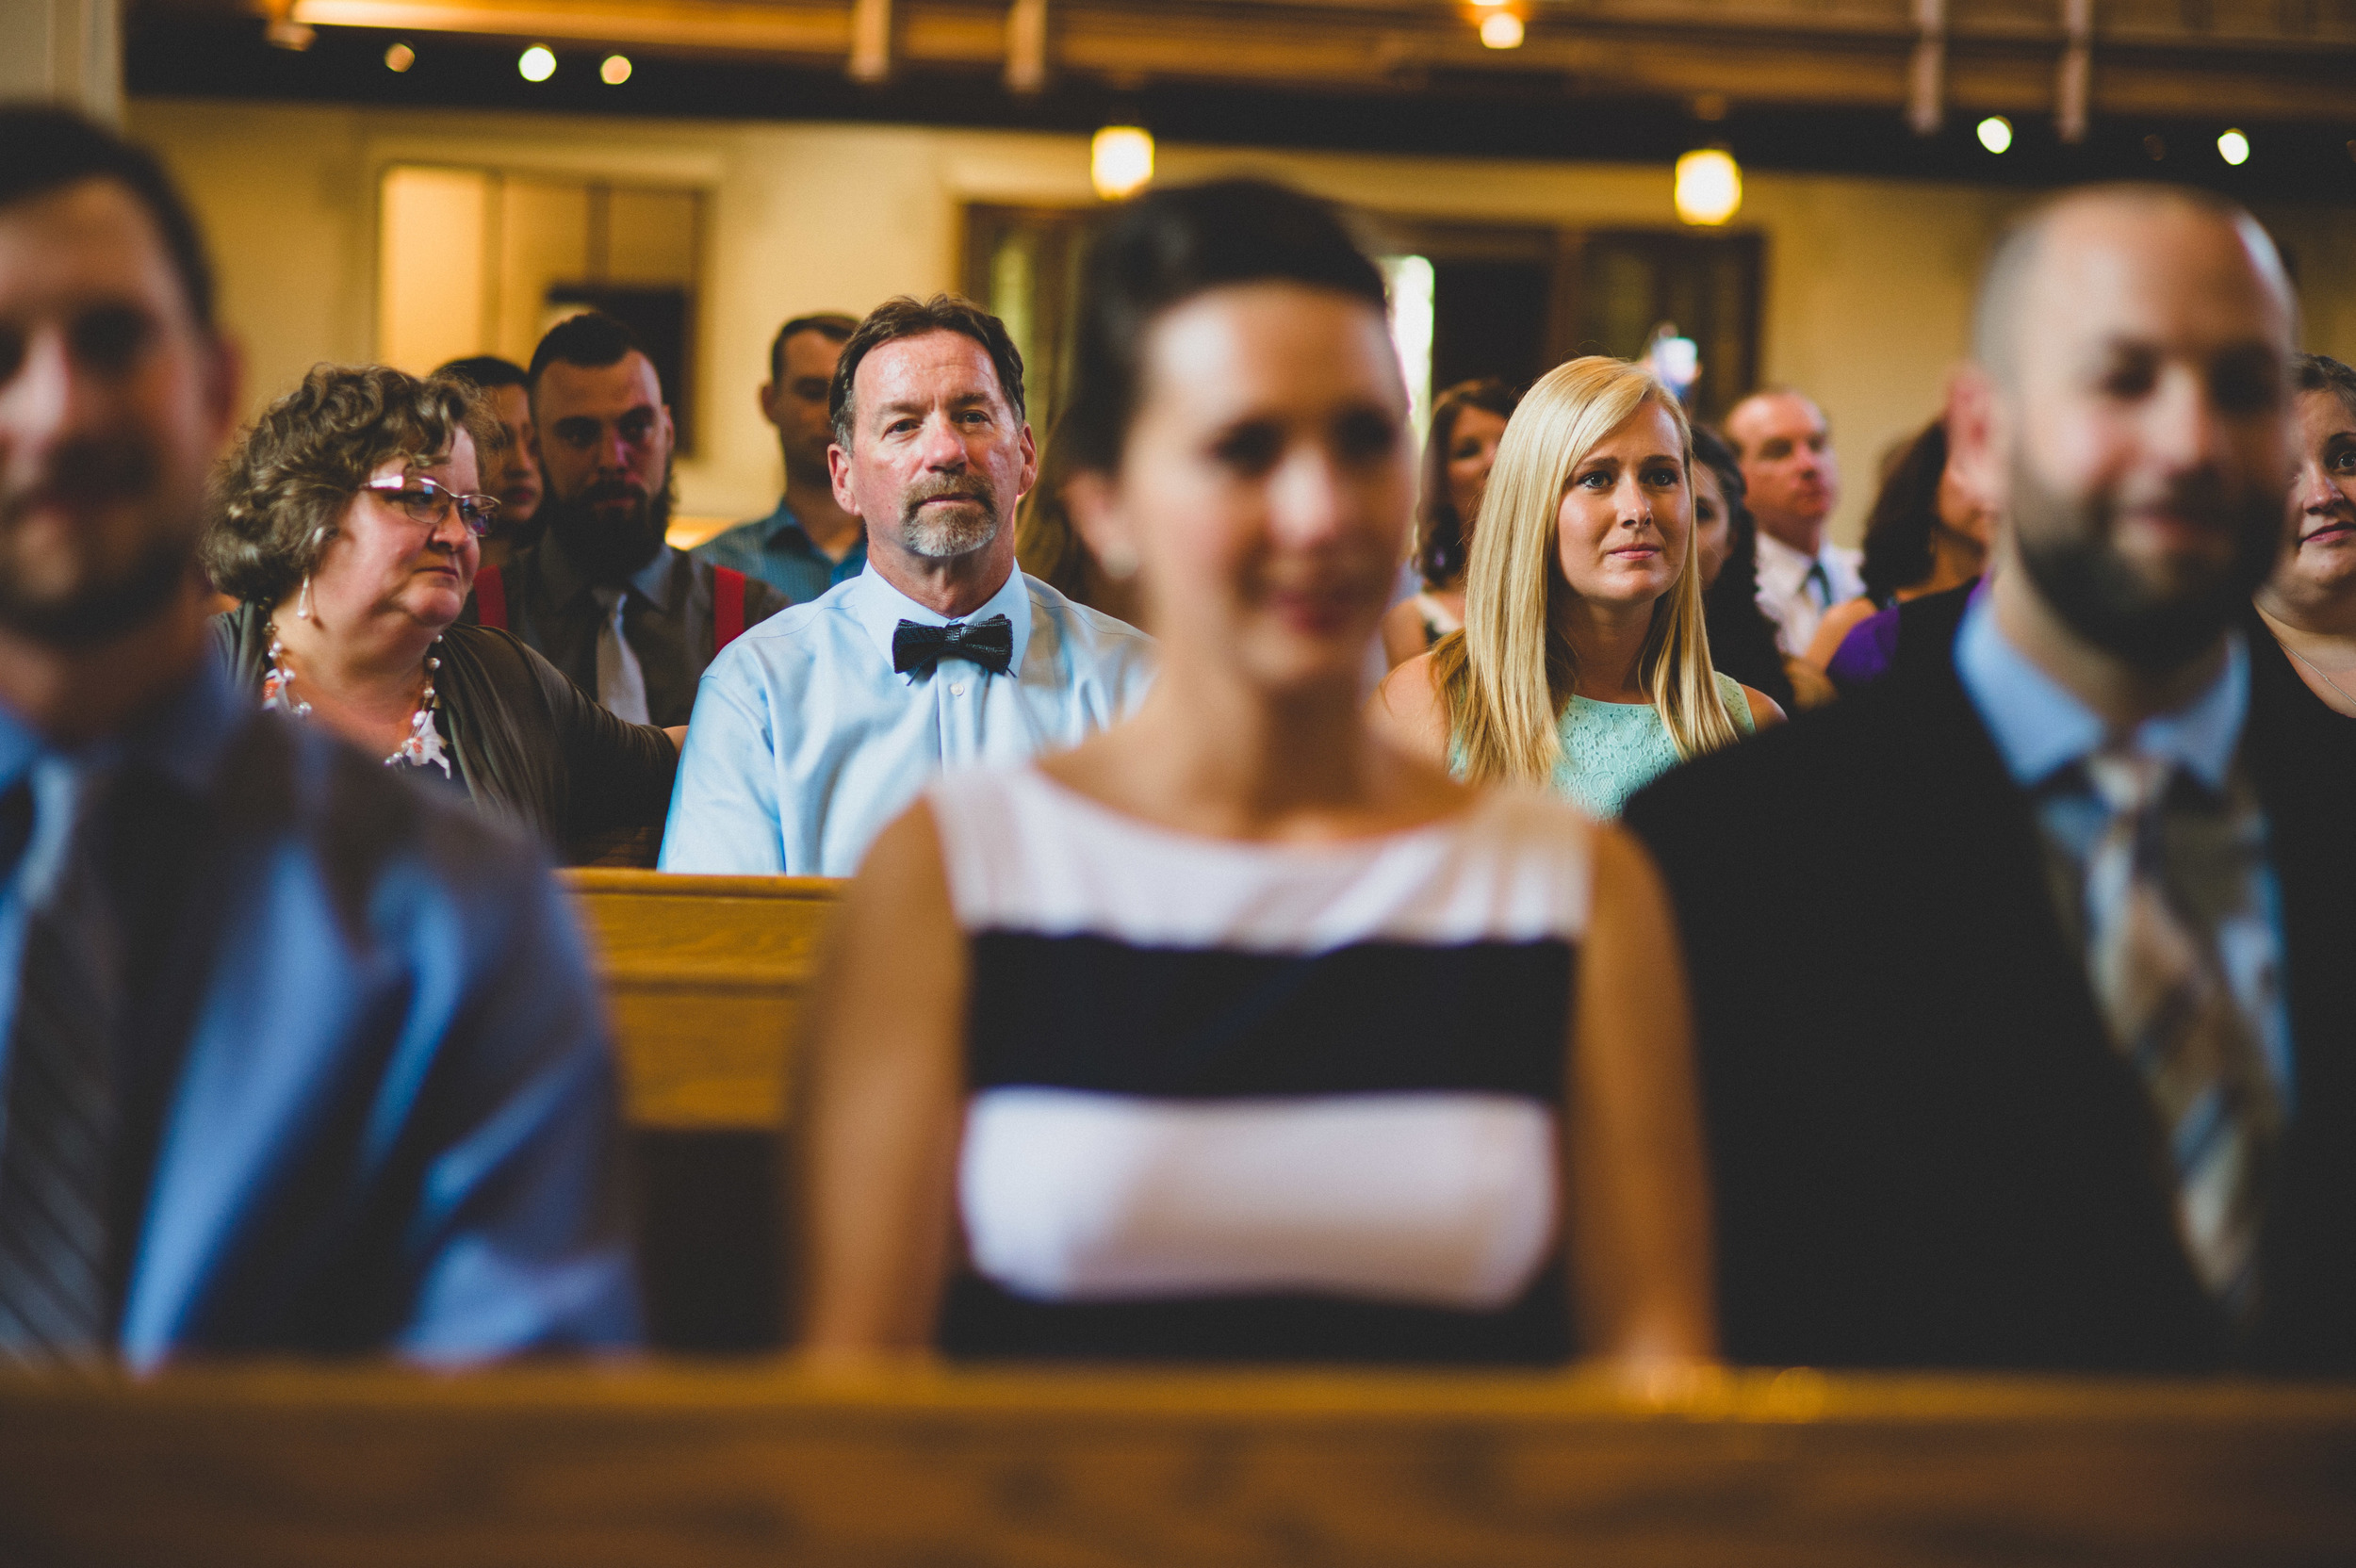 Vancouver St Augustine 's Church wedding photographer edward lai photography-50.jpg